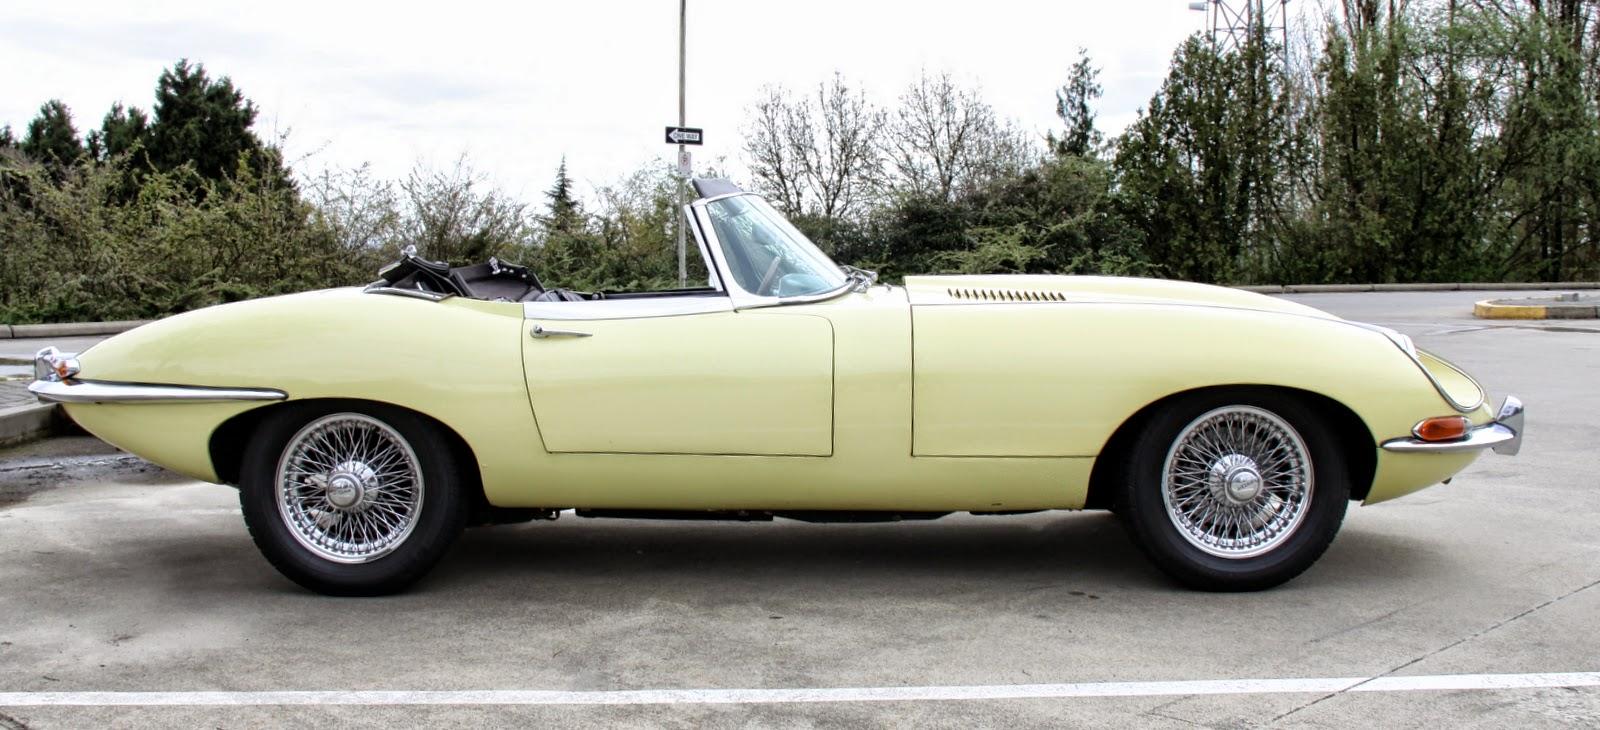 1968 jaguar E 4.2 rdstr series 1.5